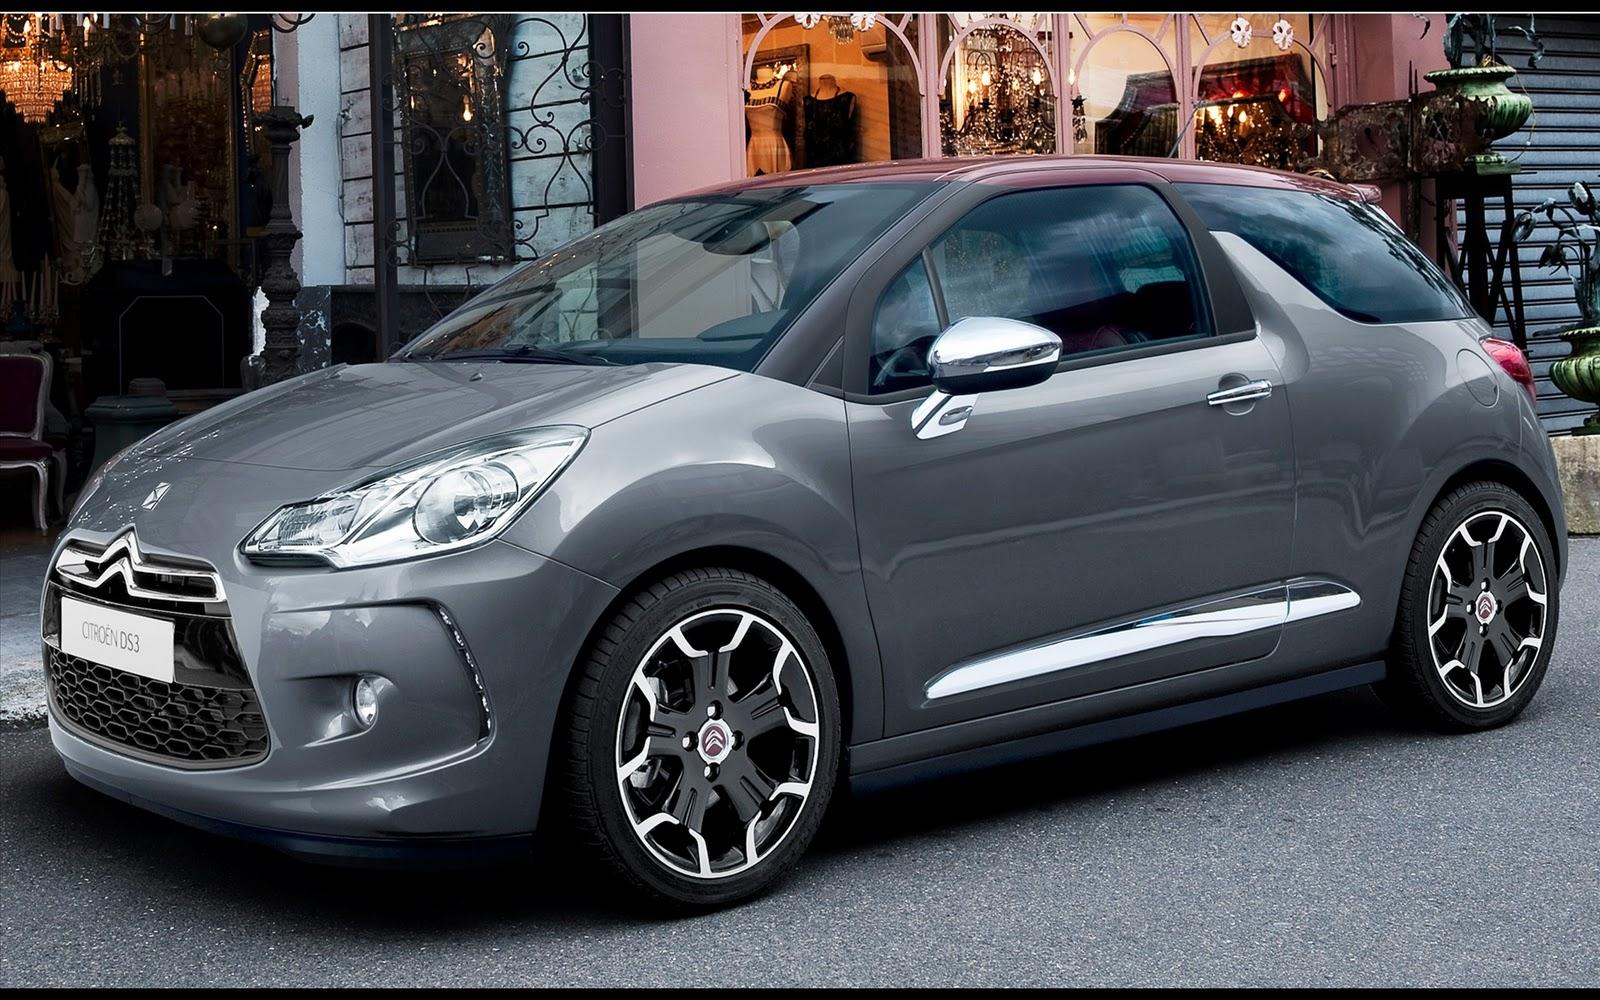 car site news car review car picture and more 2012 citroen ds3. Black Bedroom Furniture Sets. Home Design Ideas